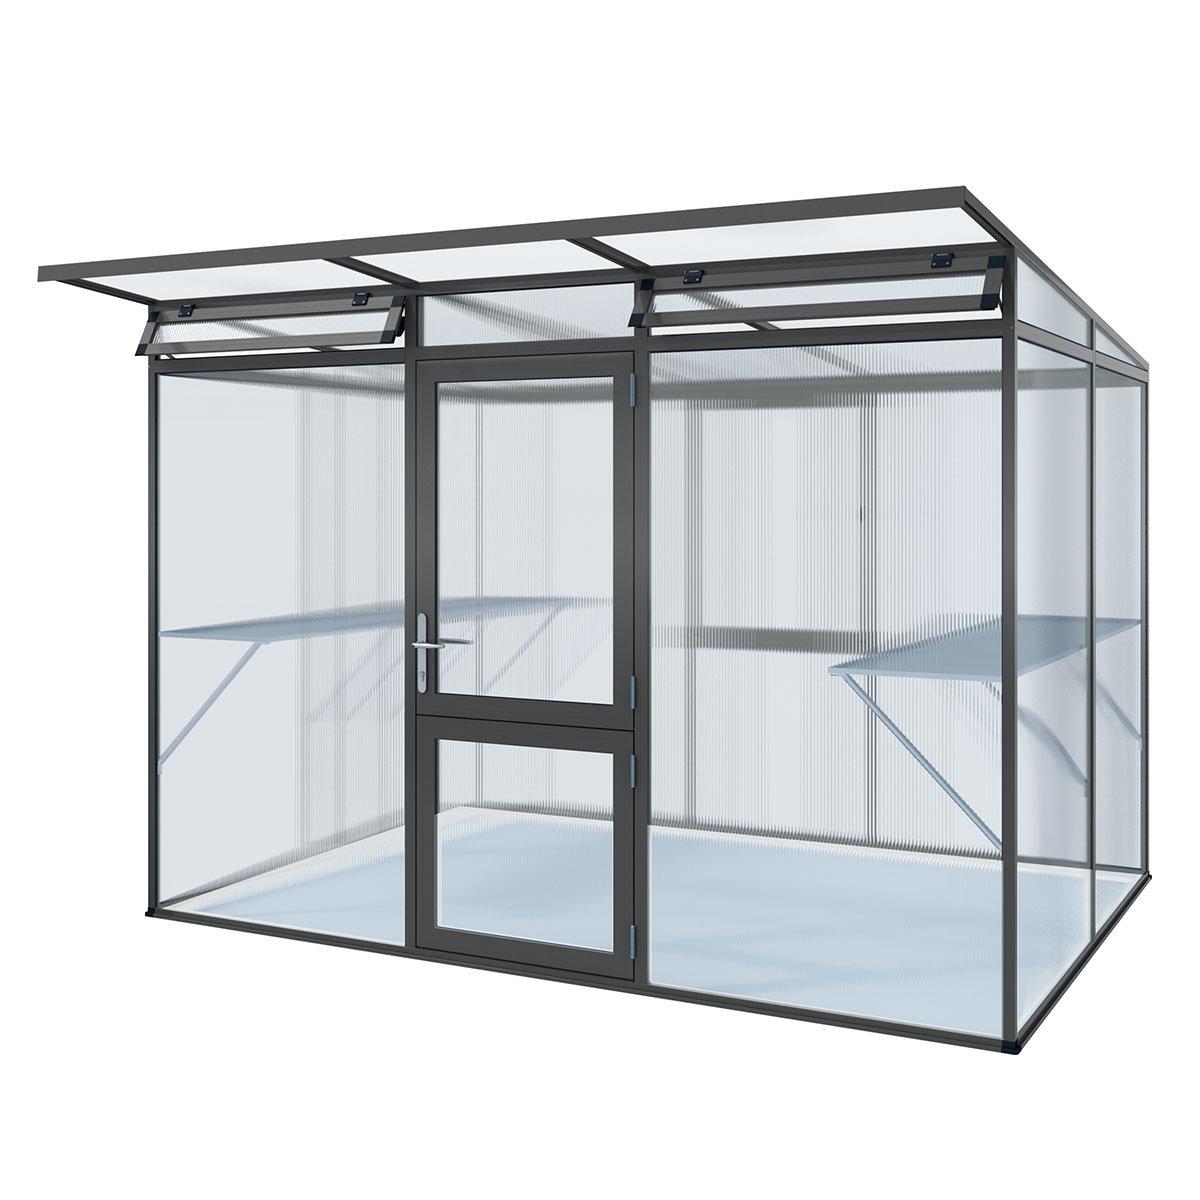 kgt gew chshaus linea ii 297 x 217 cm anthrazit grau. Black Bedroom Furniture Sets. Home Design Ideas